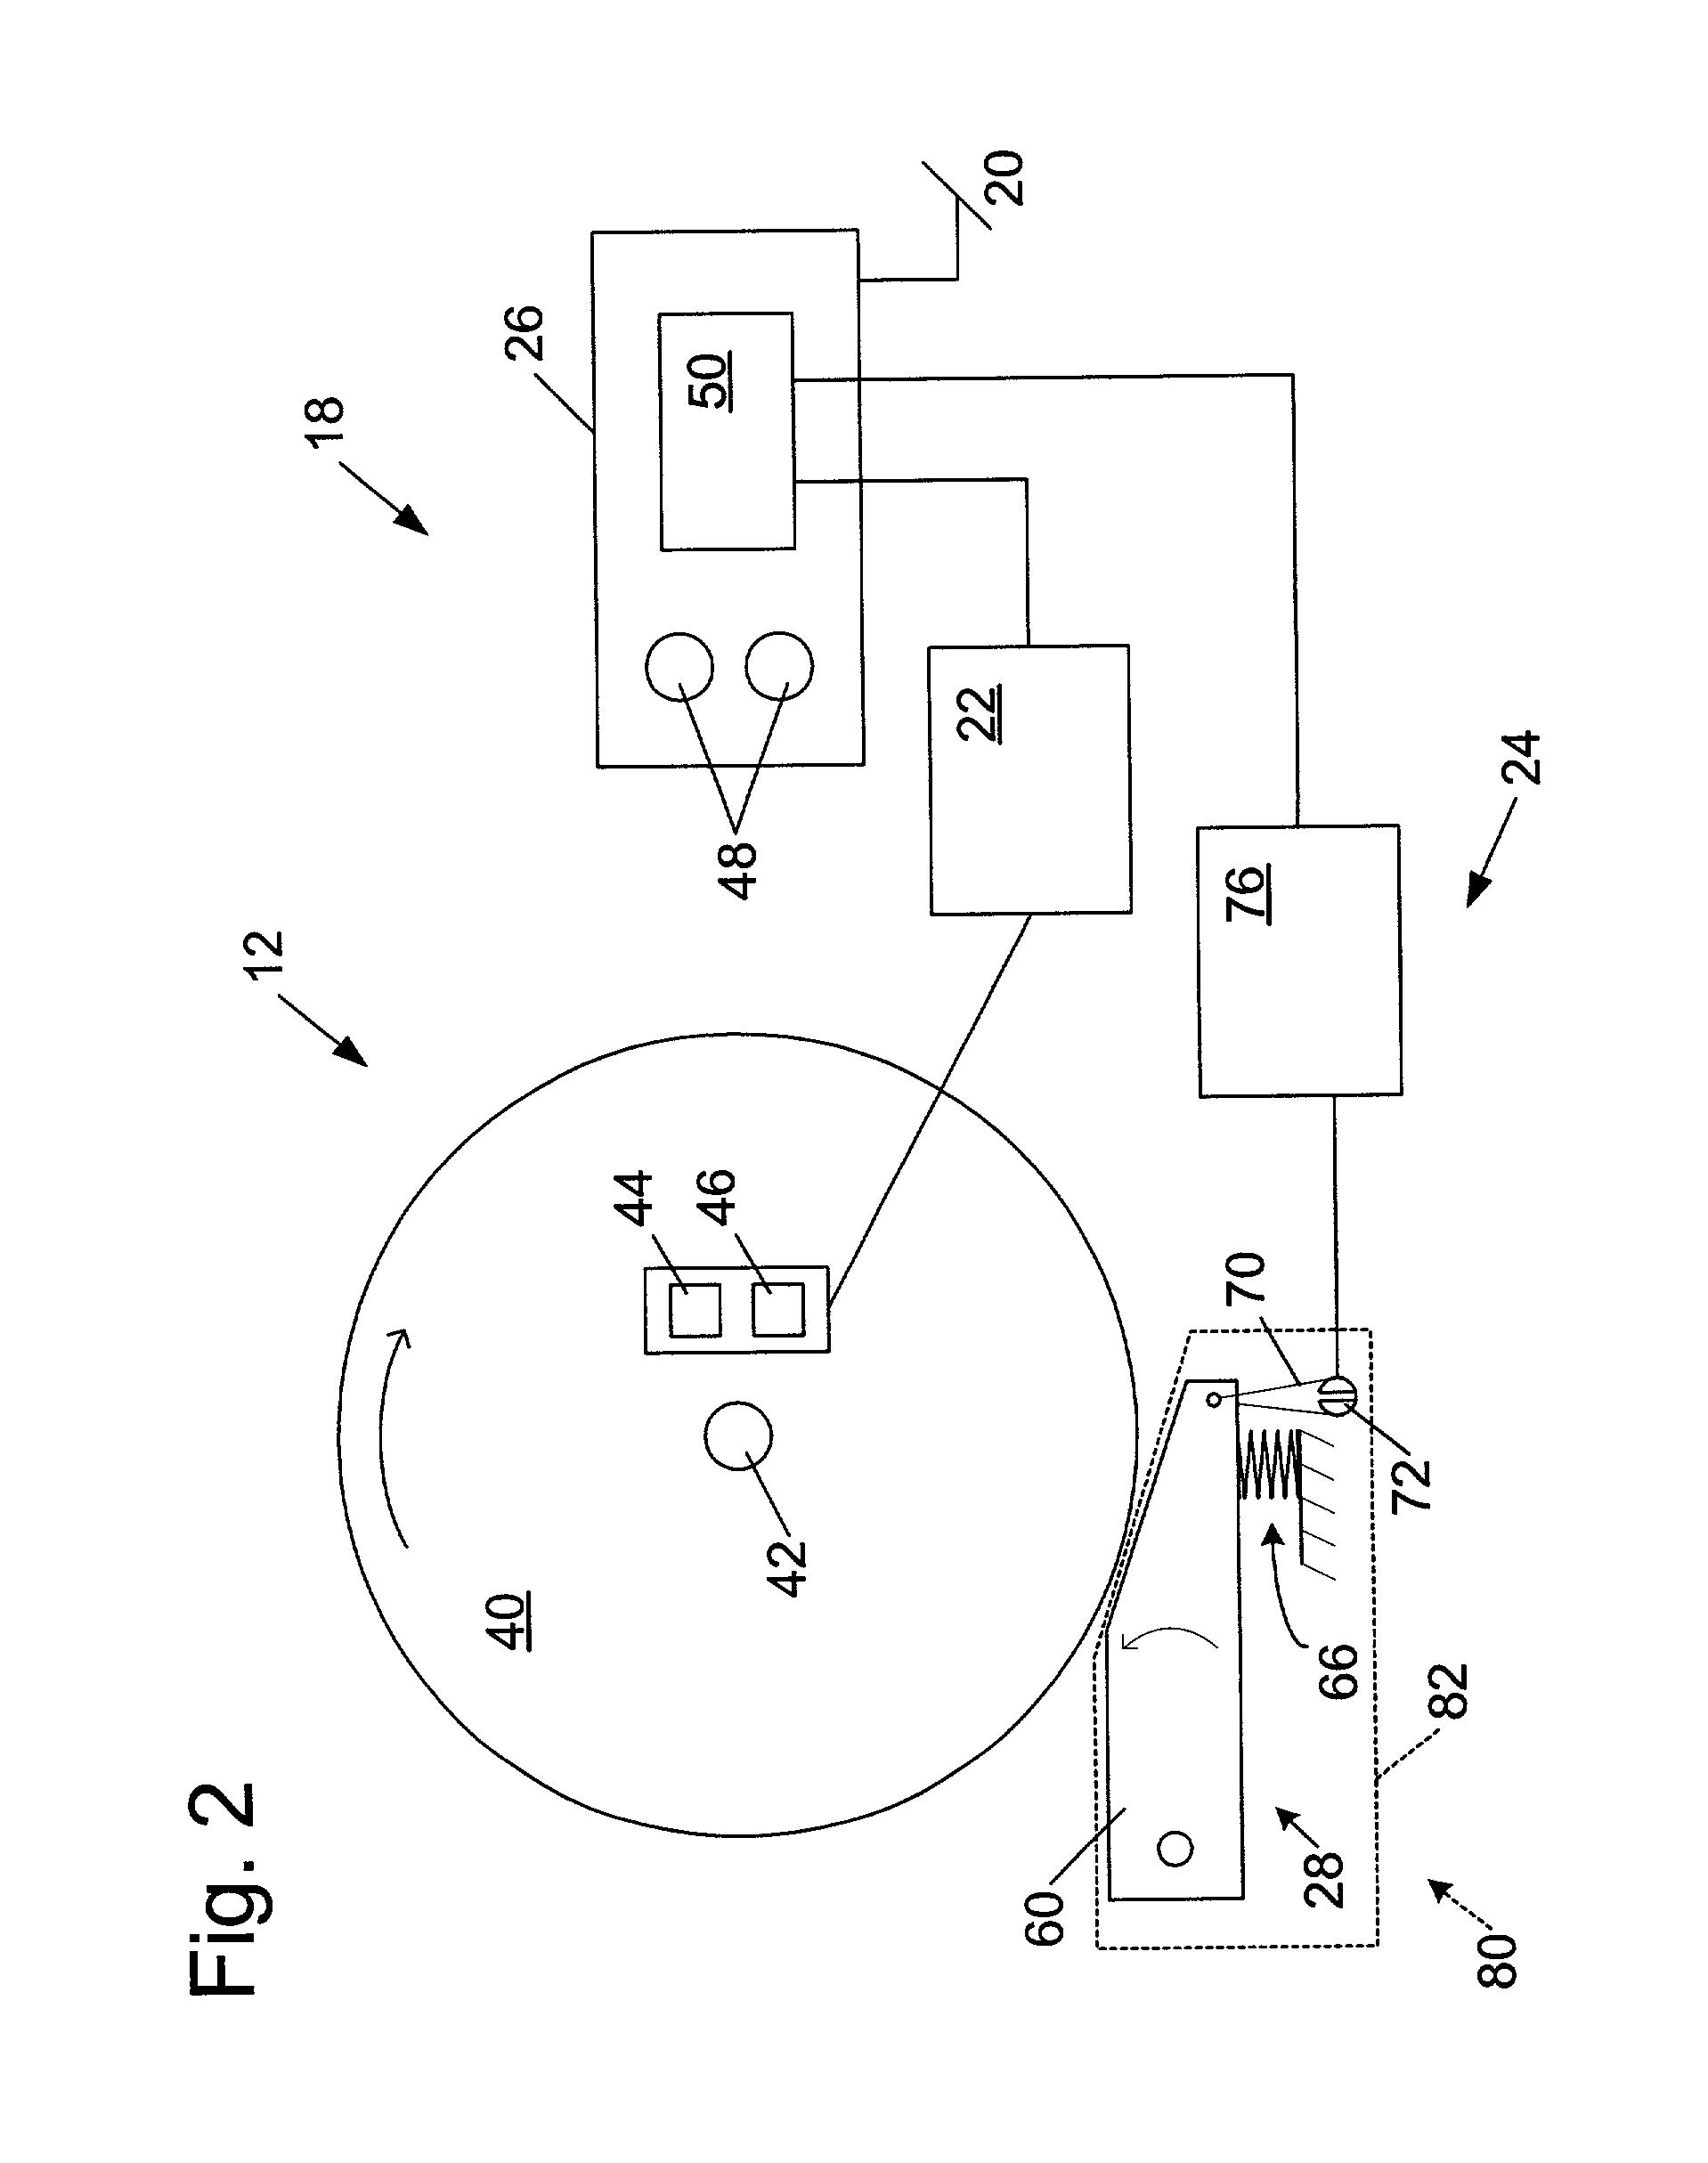 Delta Table Saw Motor Wiring Diagram - Database